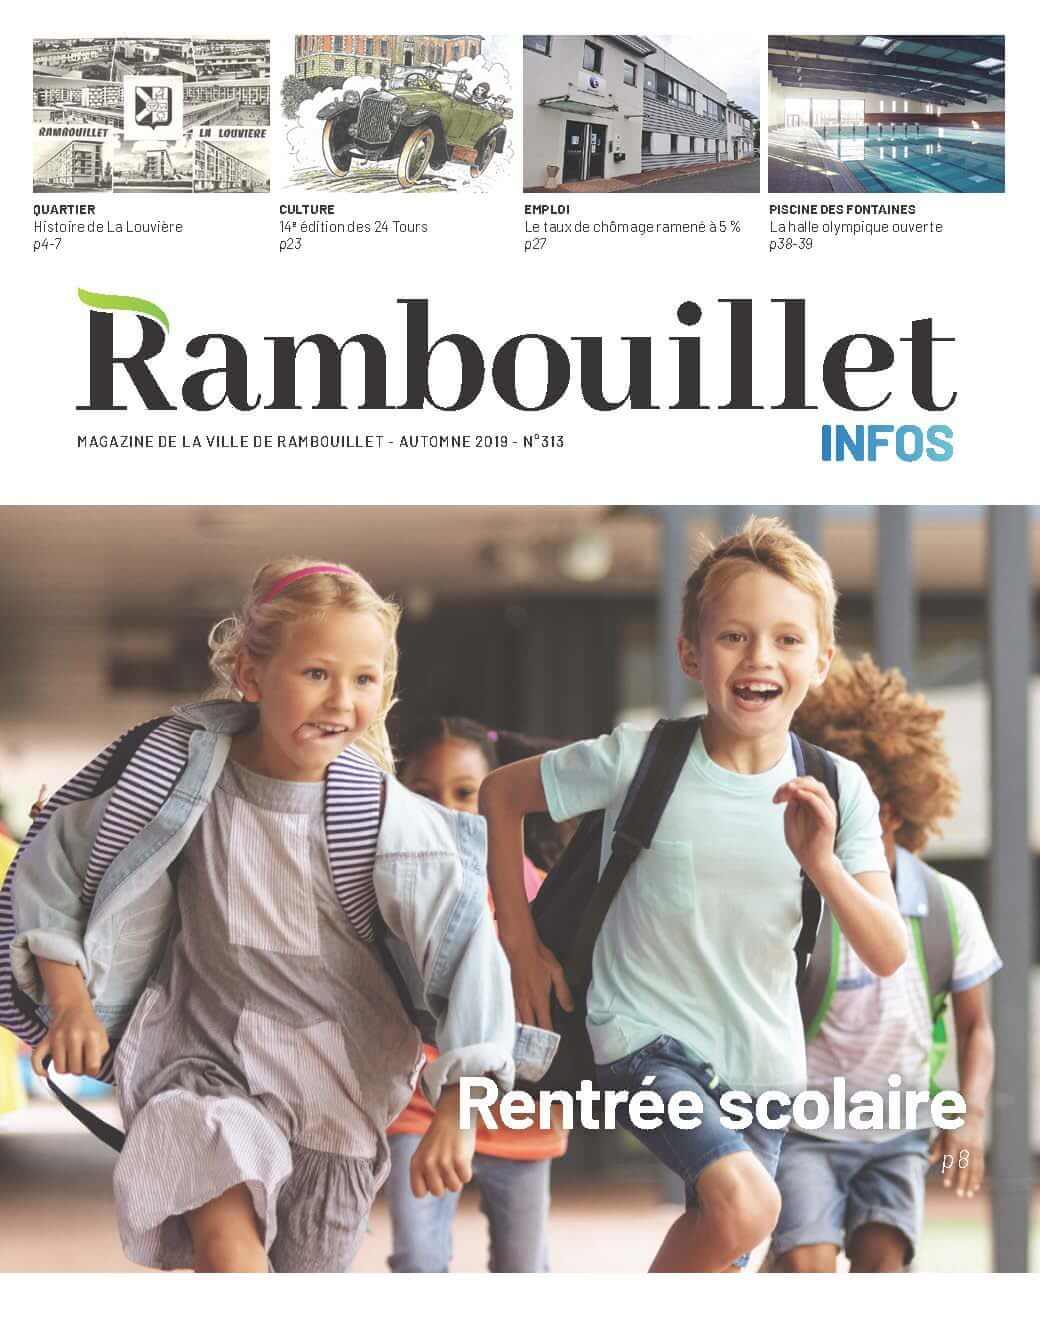 Couverture Rambouillet Infos – Automne 2019